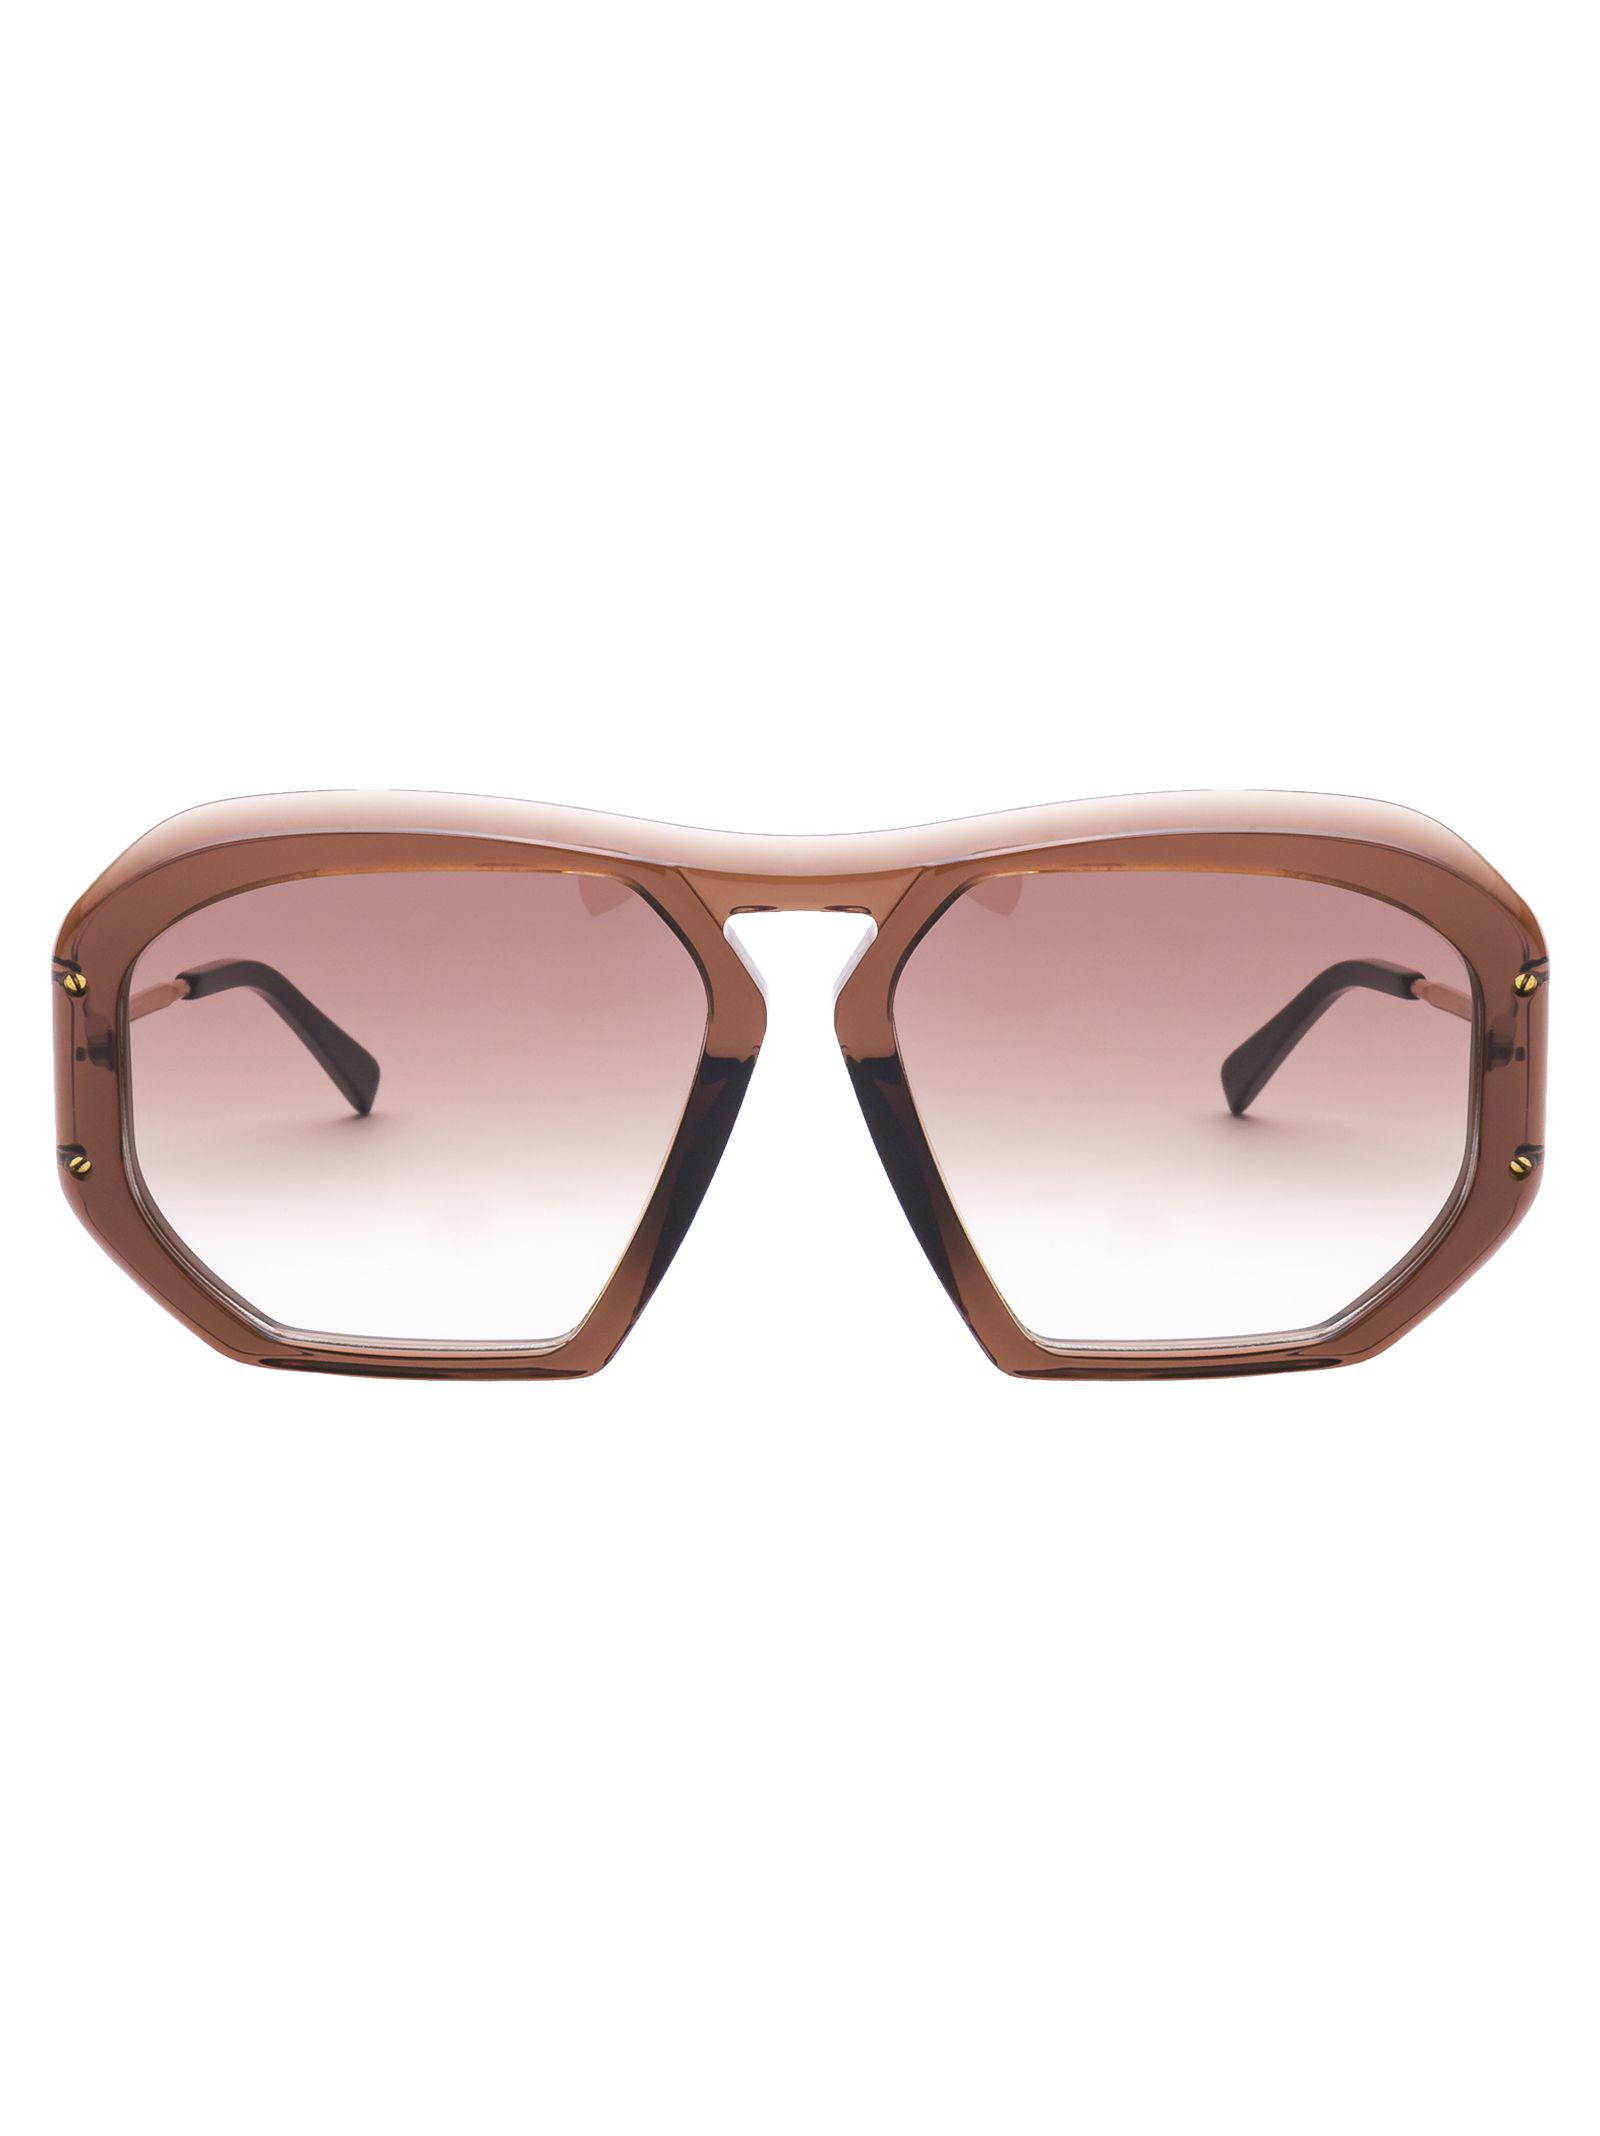 6c36c42cb6504 Celine CÉLine Eyewear Geometric Shaped Sunglasses In 48F